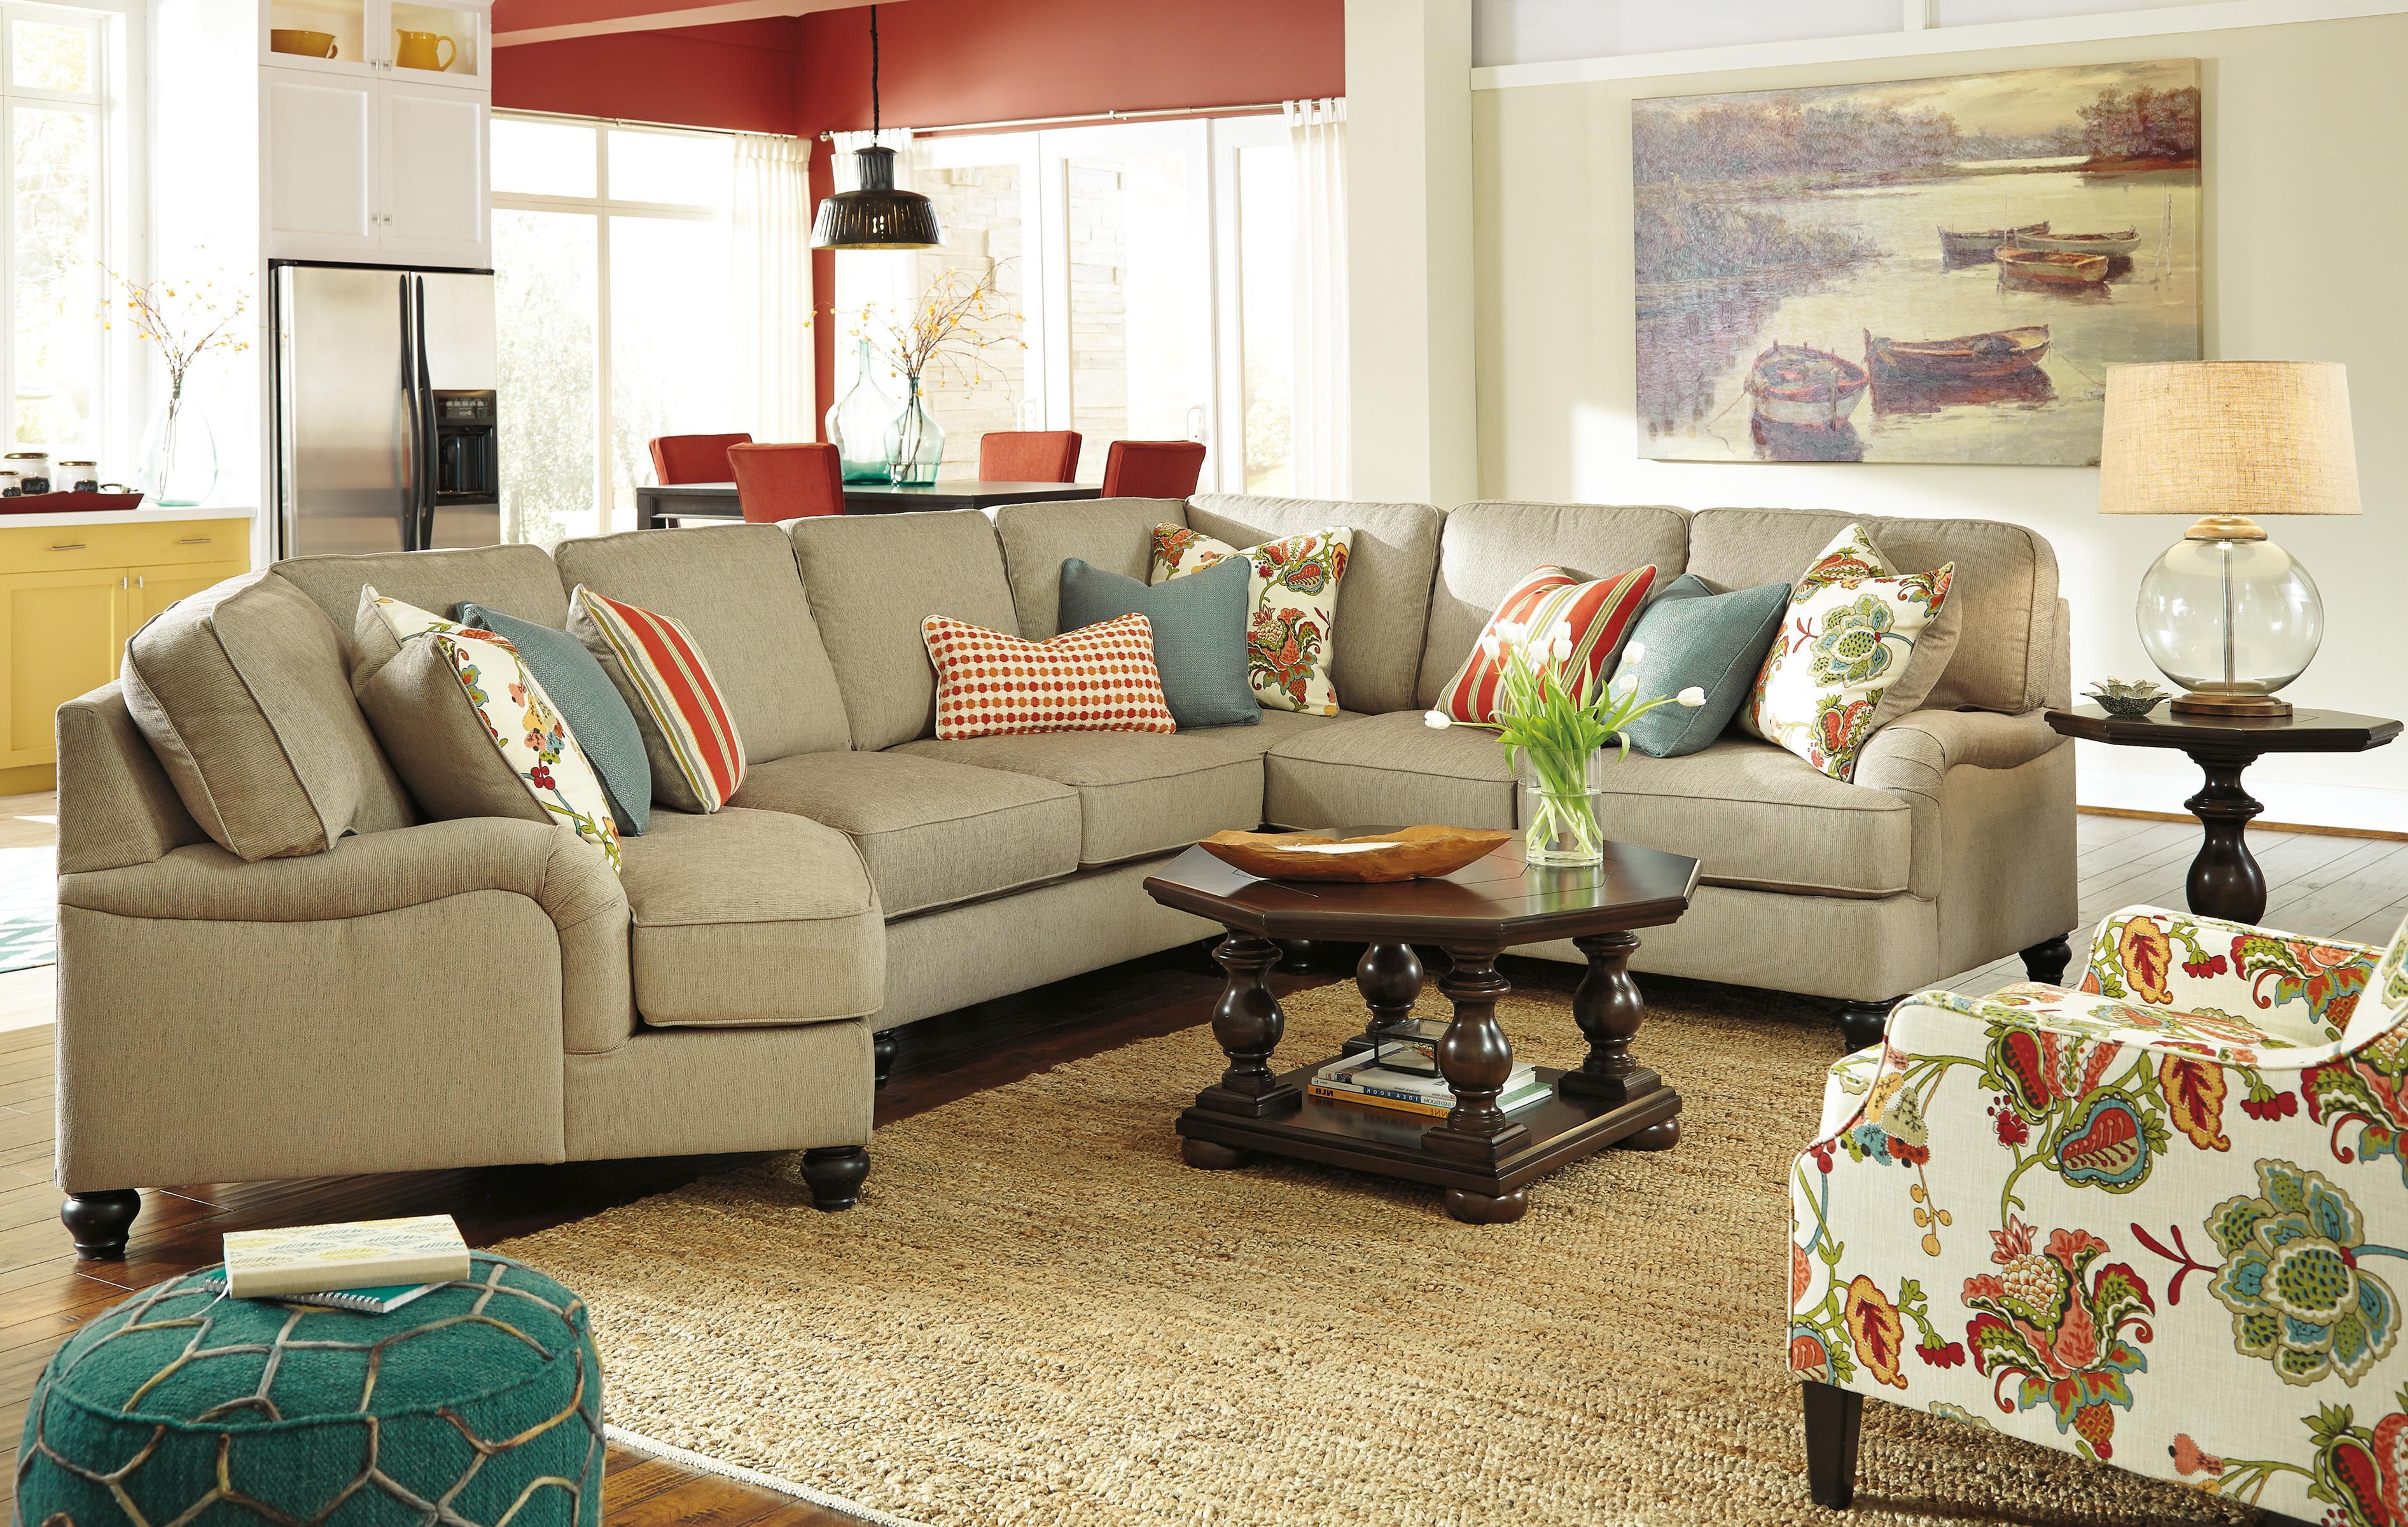 Ashley/Benchcraft Kerridon Stationary Living Room Group - Item Number: 26300 Living Room Group 11